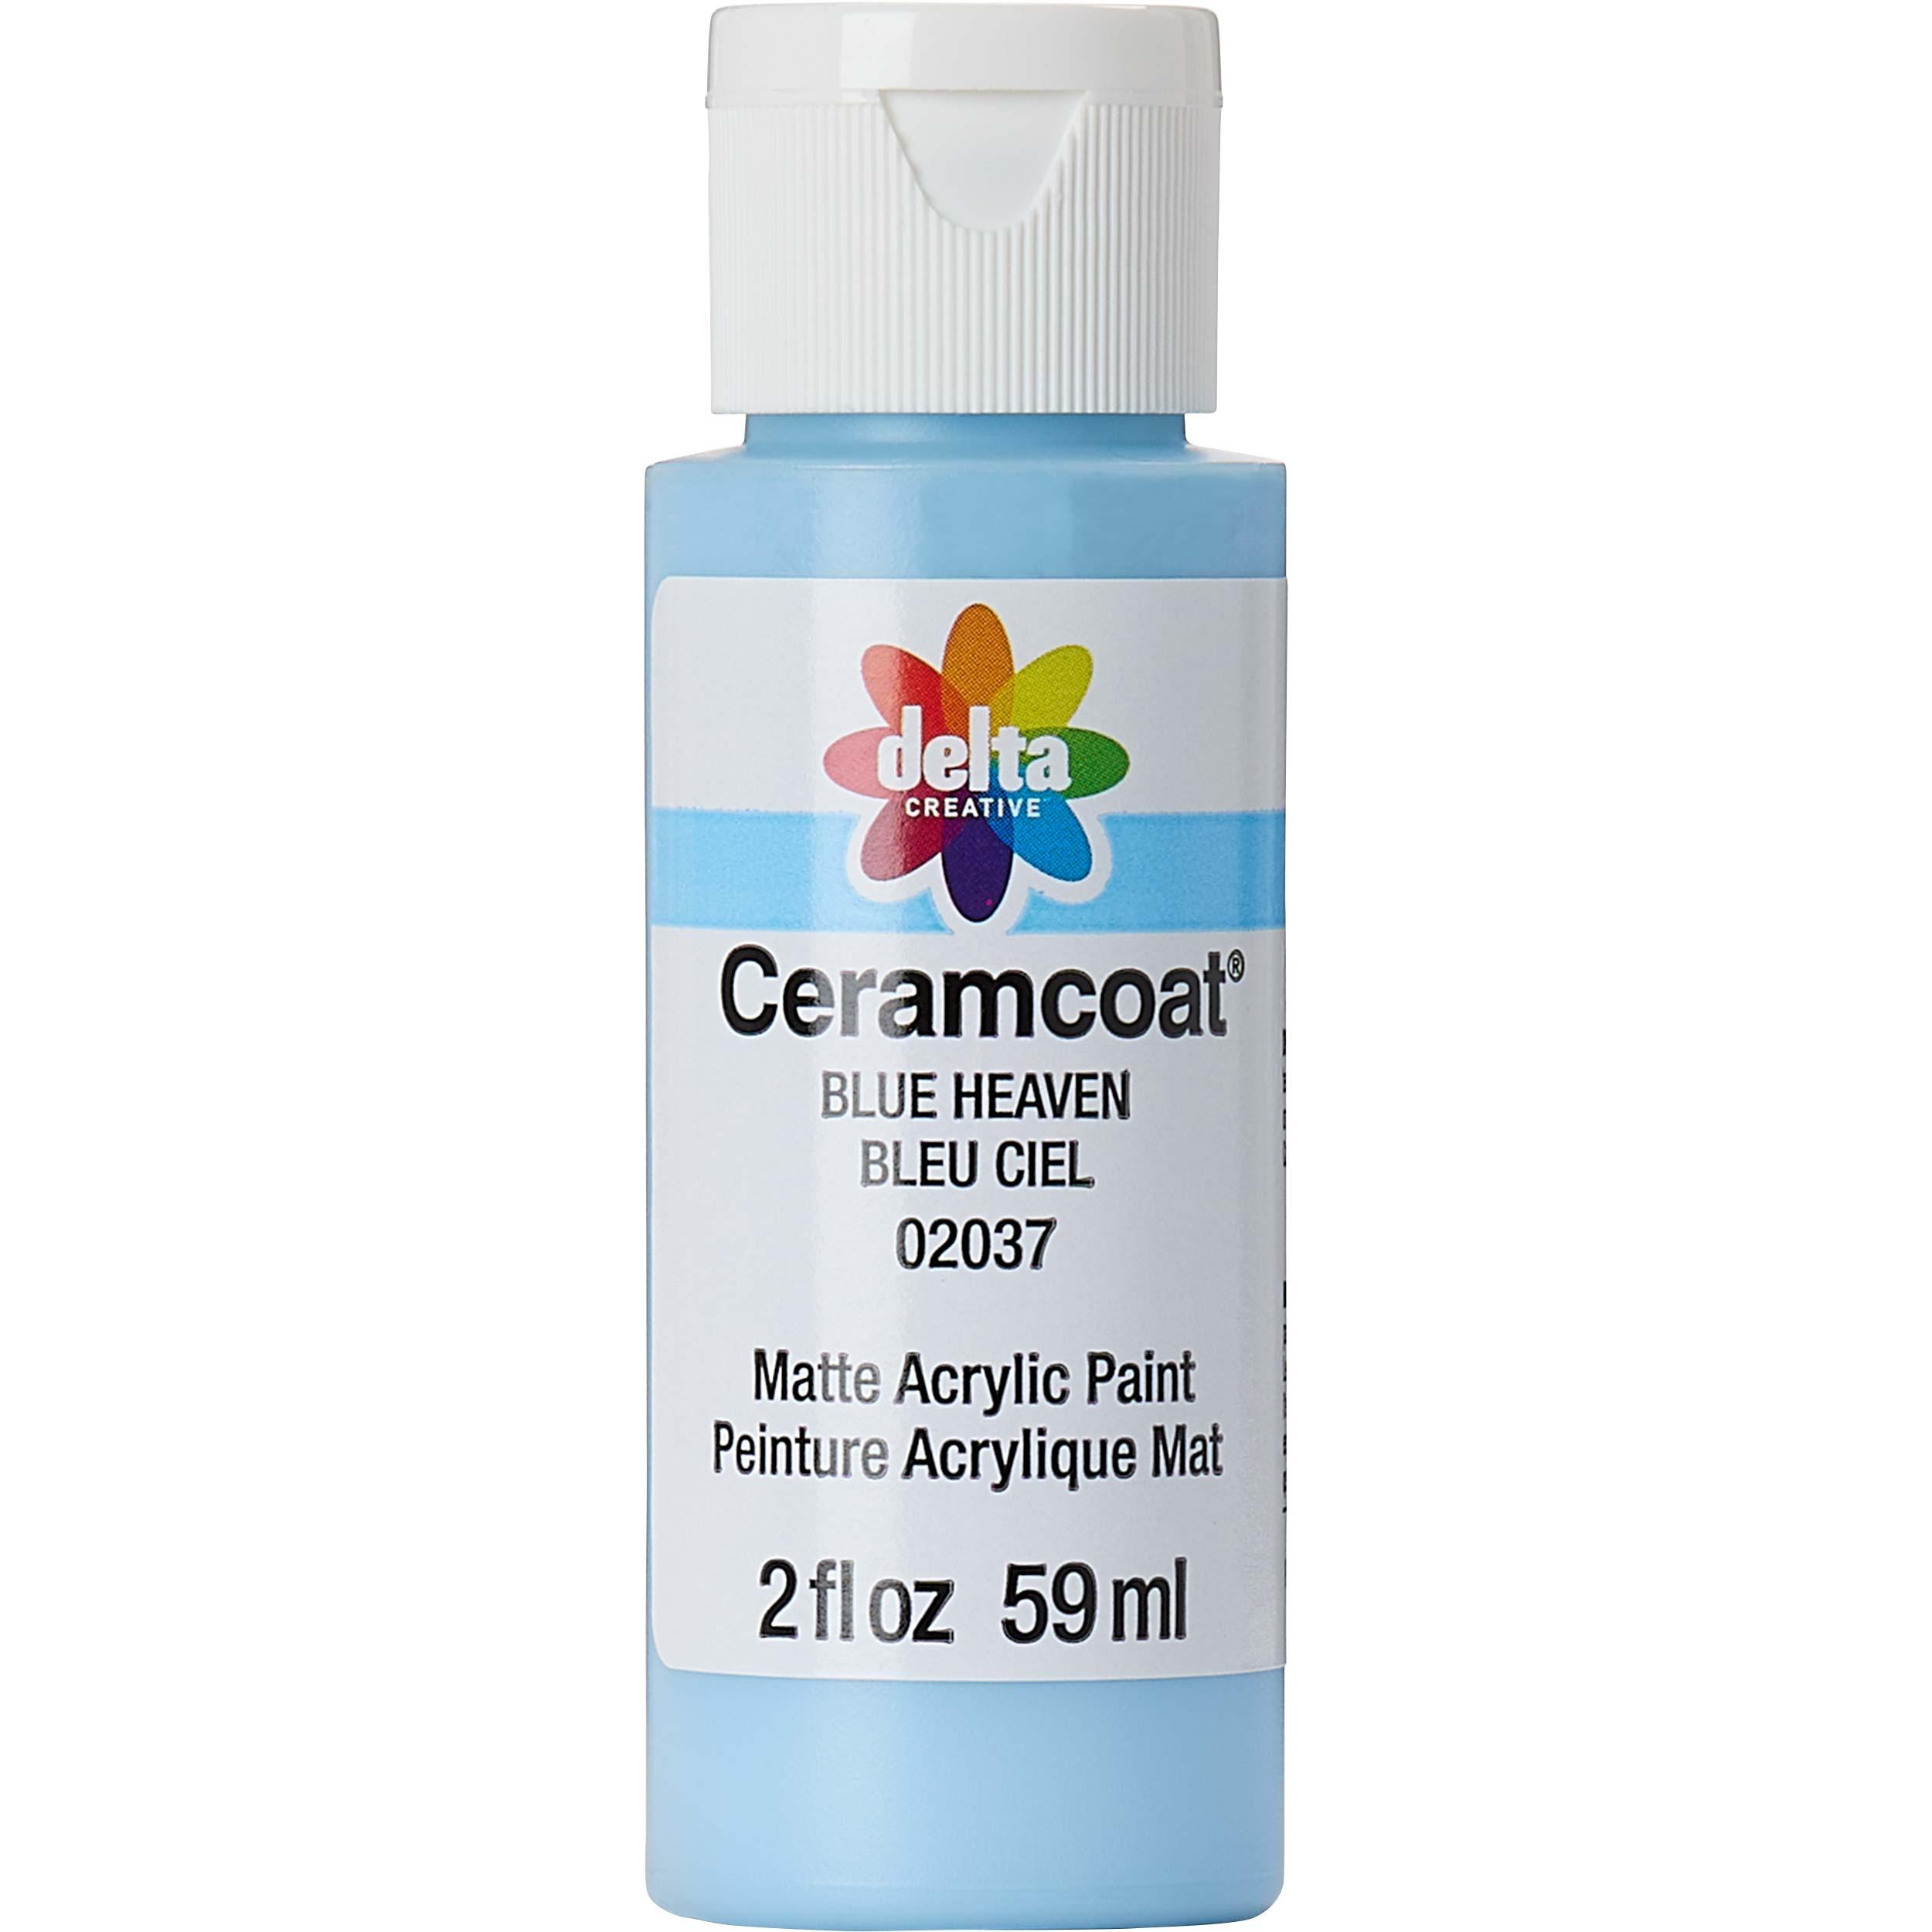 Delta Ceramcoat ® Acrylic Paint - Blue Heaven, 2 oz.